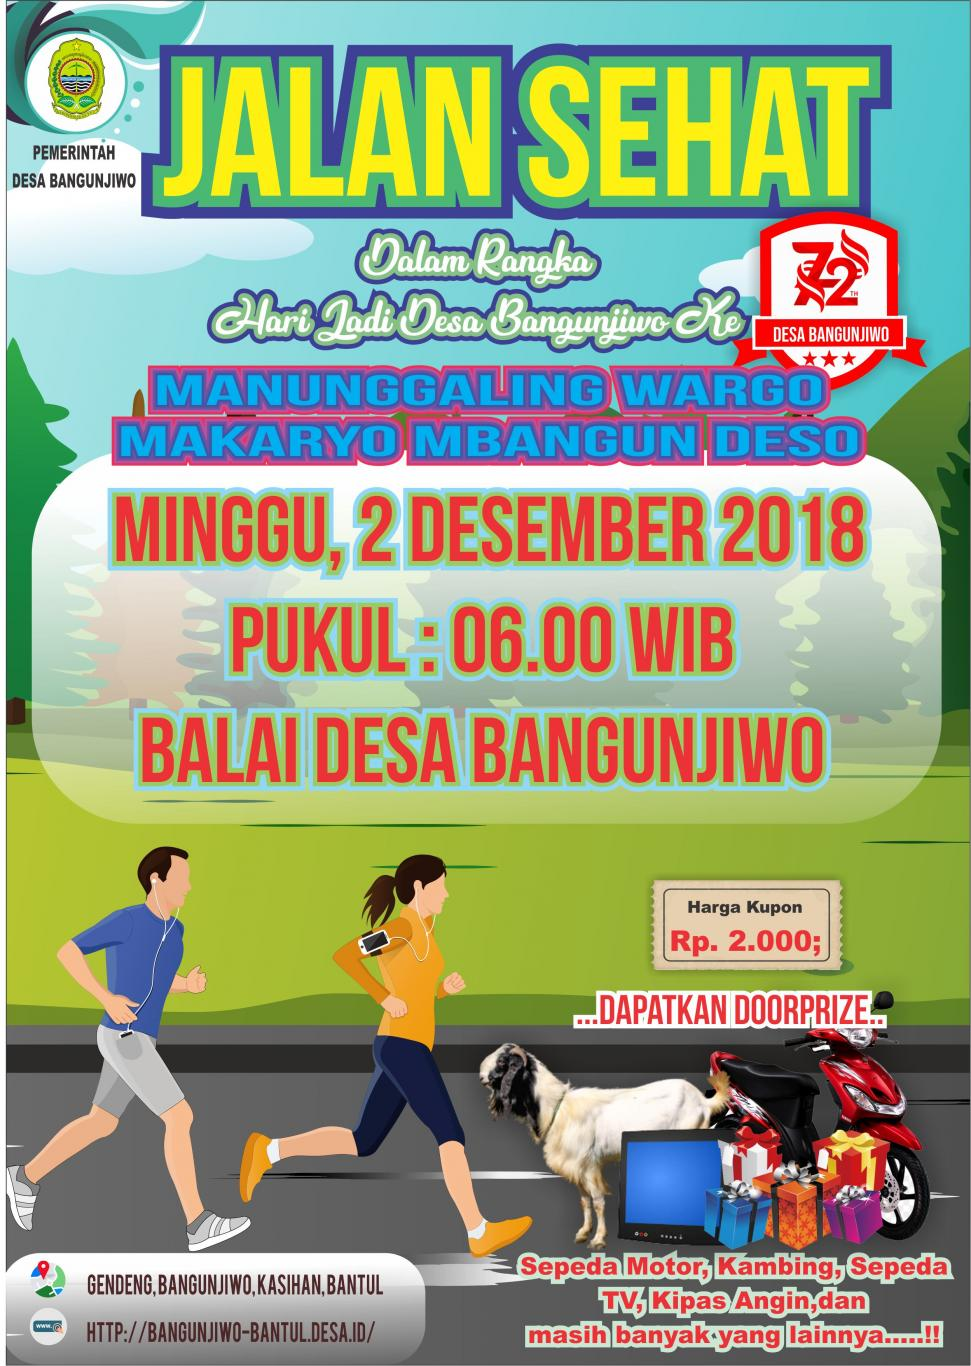 Daftar Segera Jalan Sehat Desa Bangunjiwo Website Desa Bangunjiwo